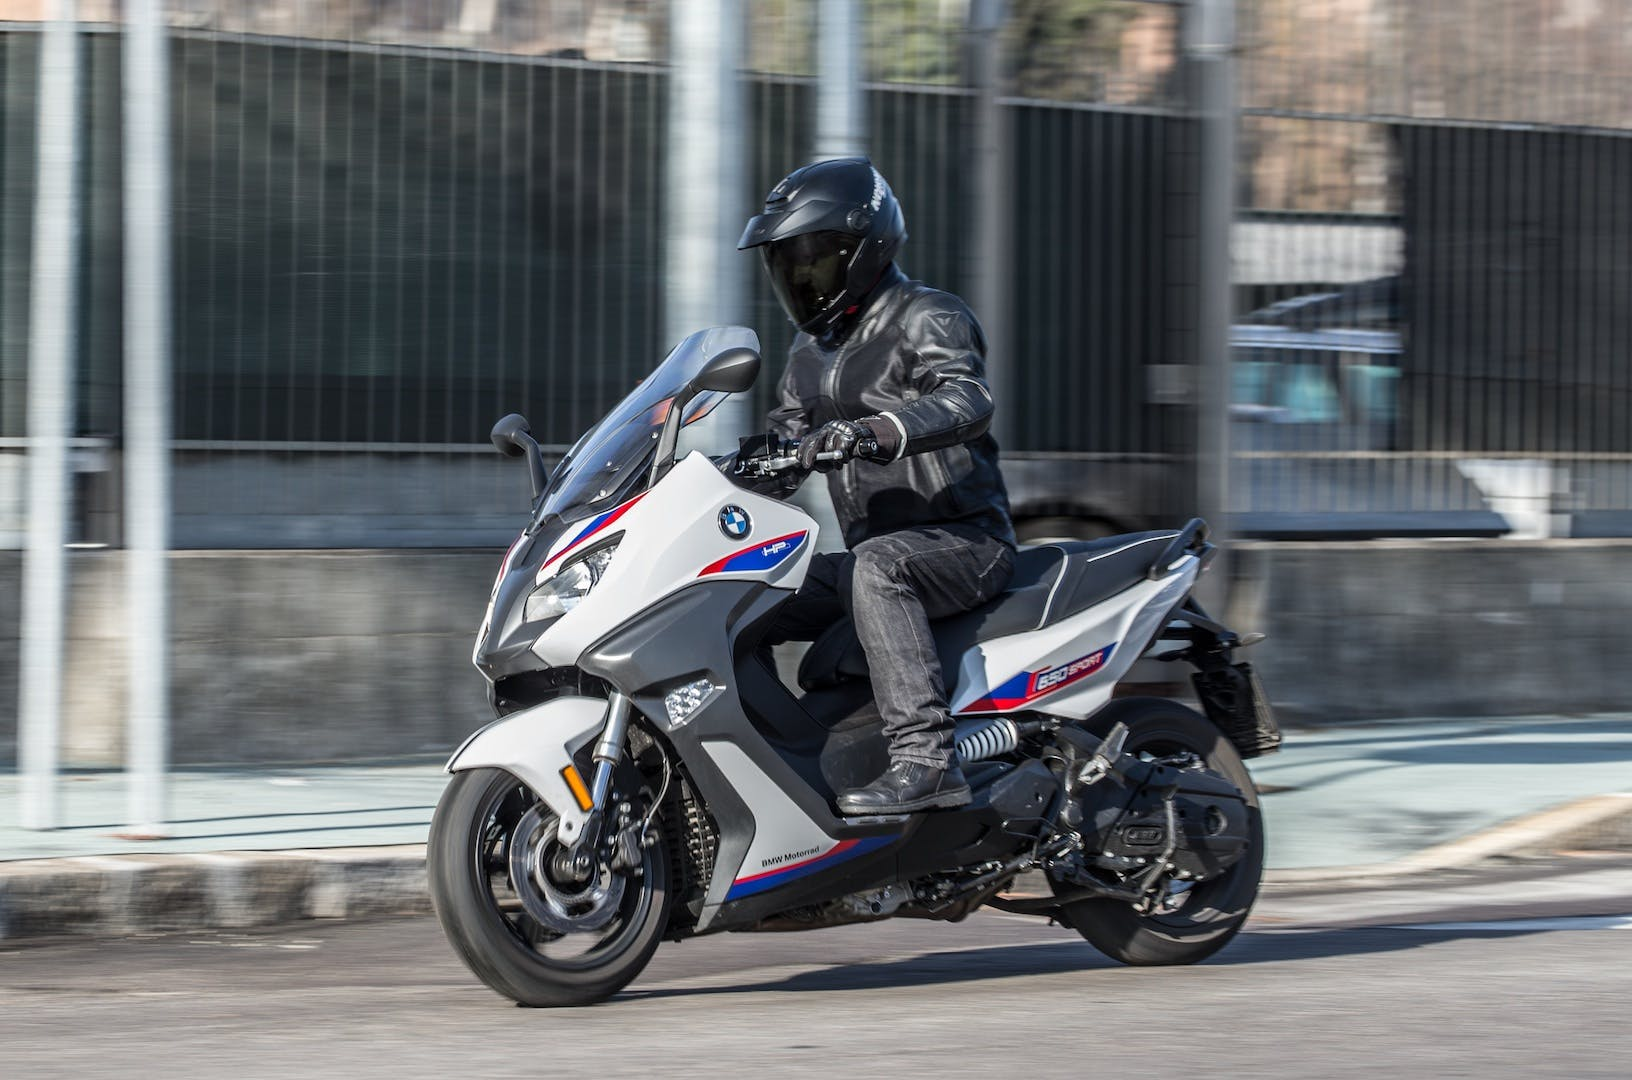 Moto-vs-scooter-053